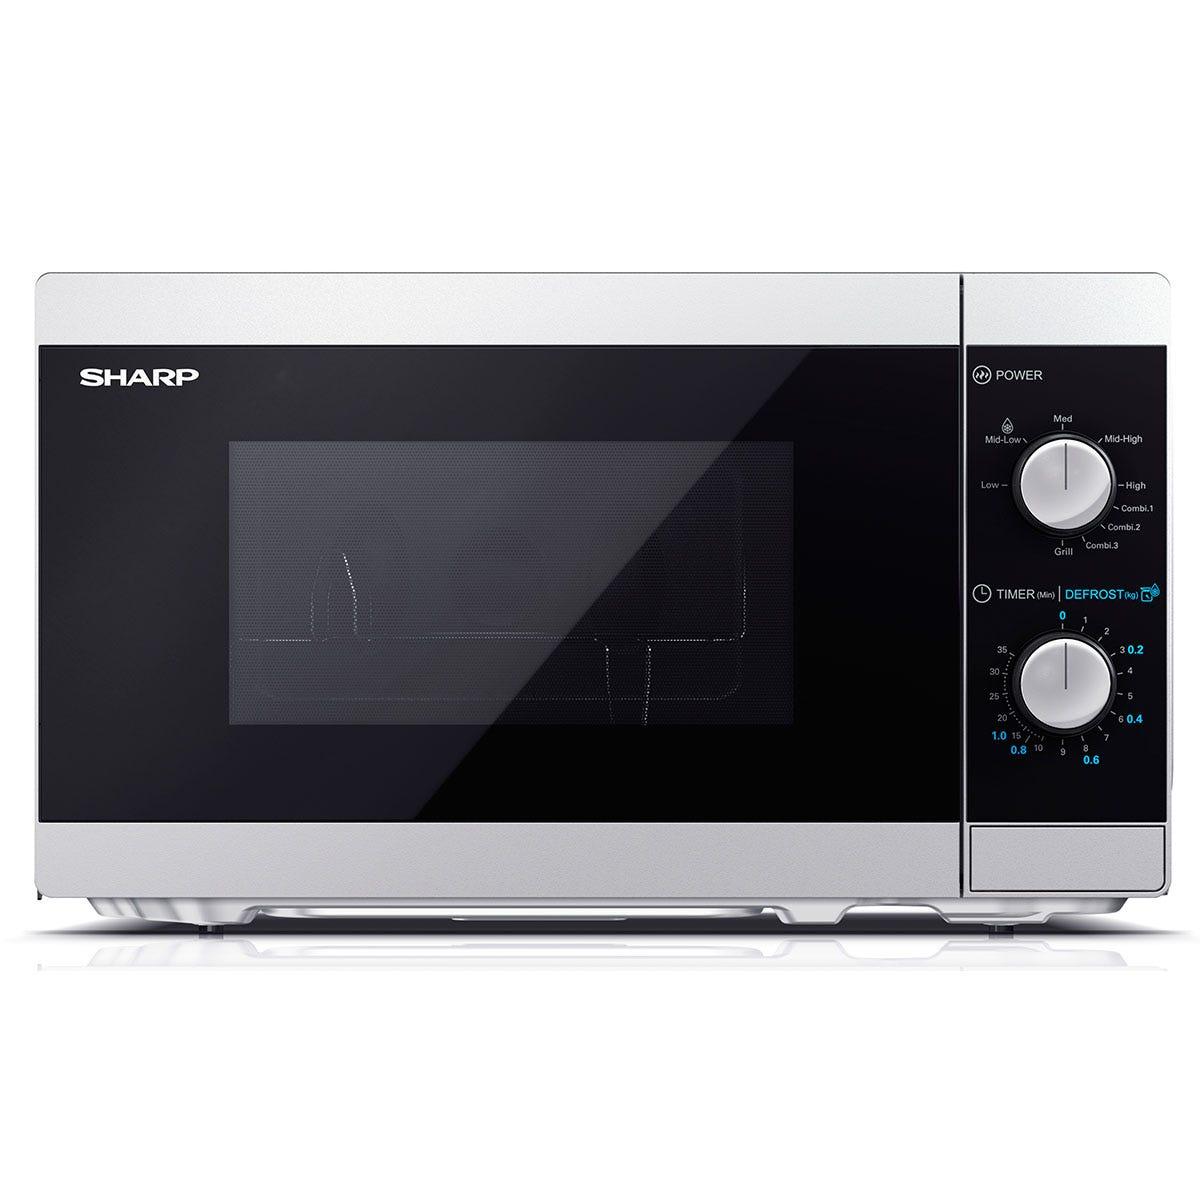 Sharp YC-MG01U-S 800W Solo 20L Microwave with 1000W Grill - Silver